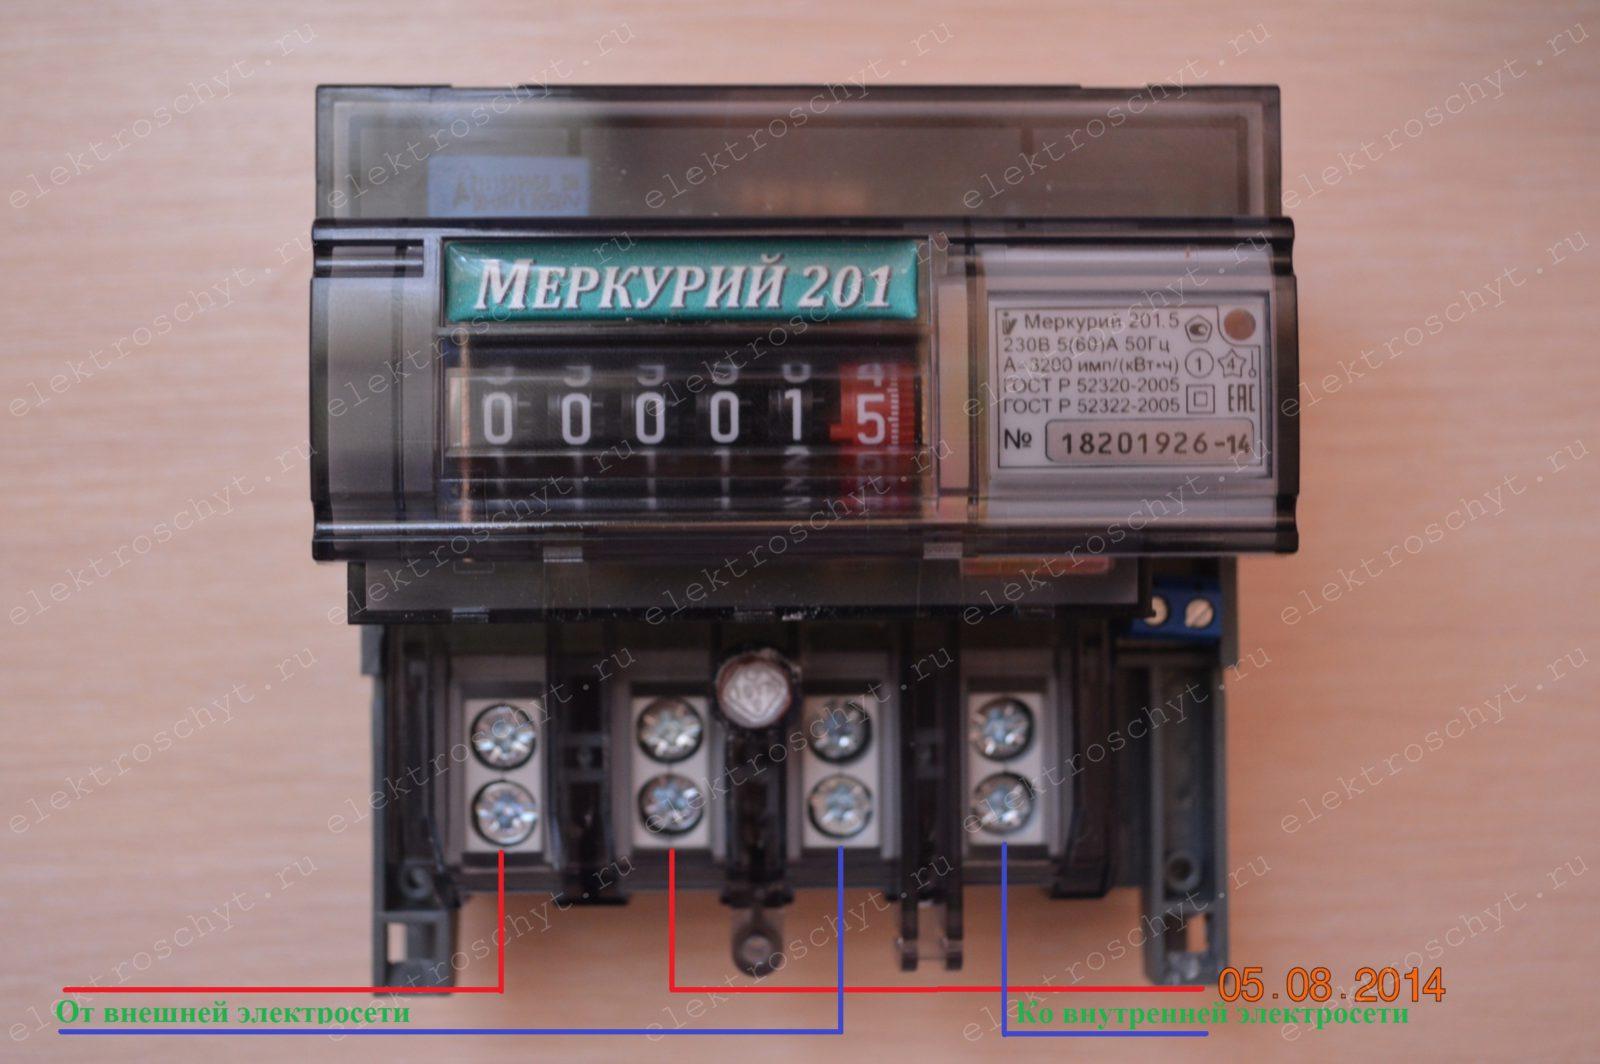 Меркурий 200 схема подключения счетчика